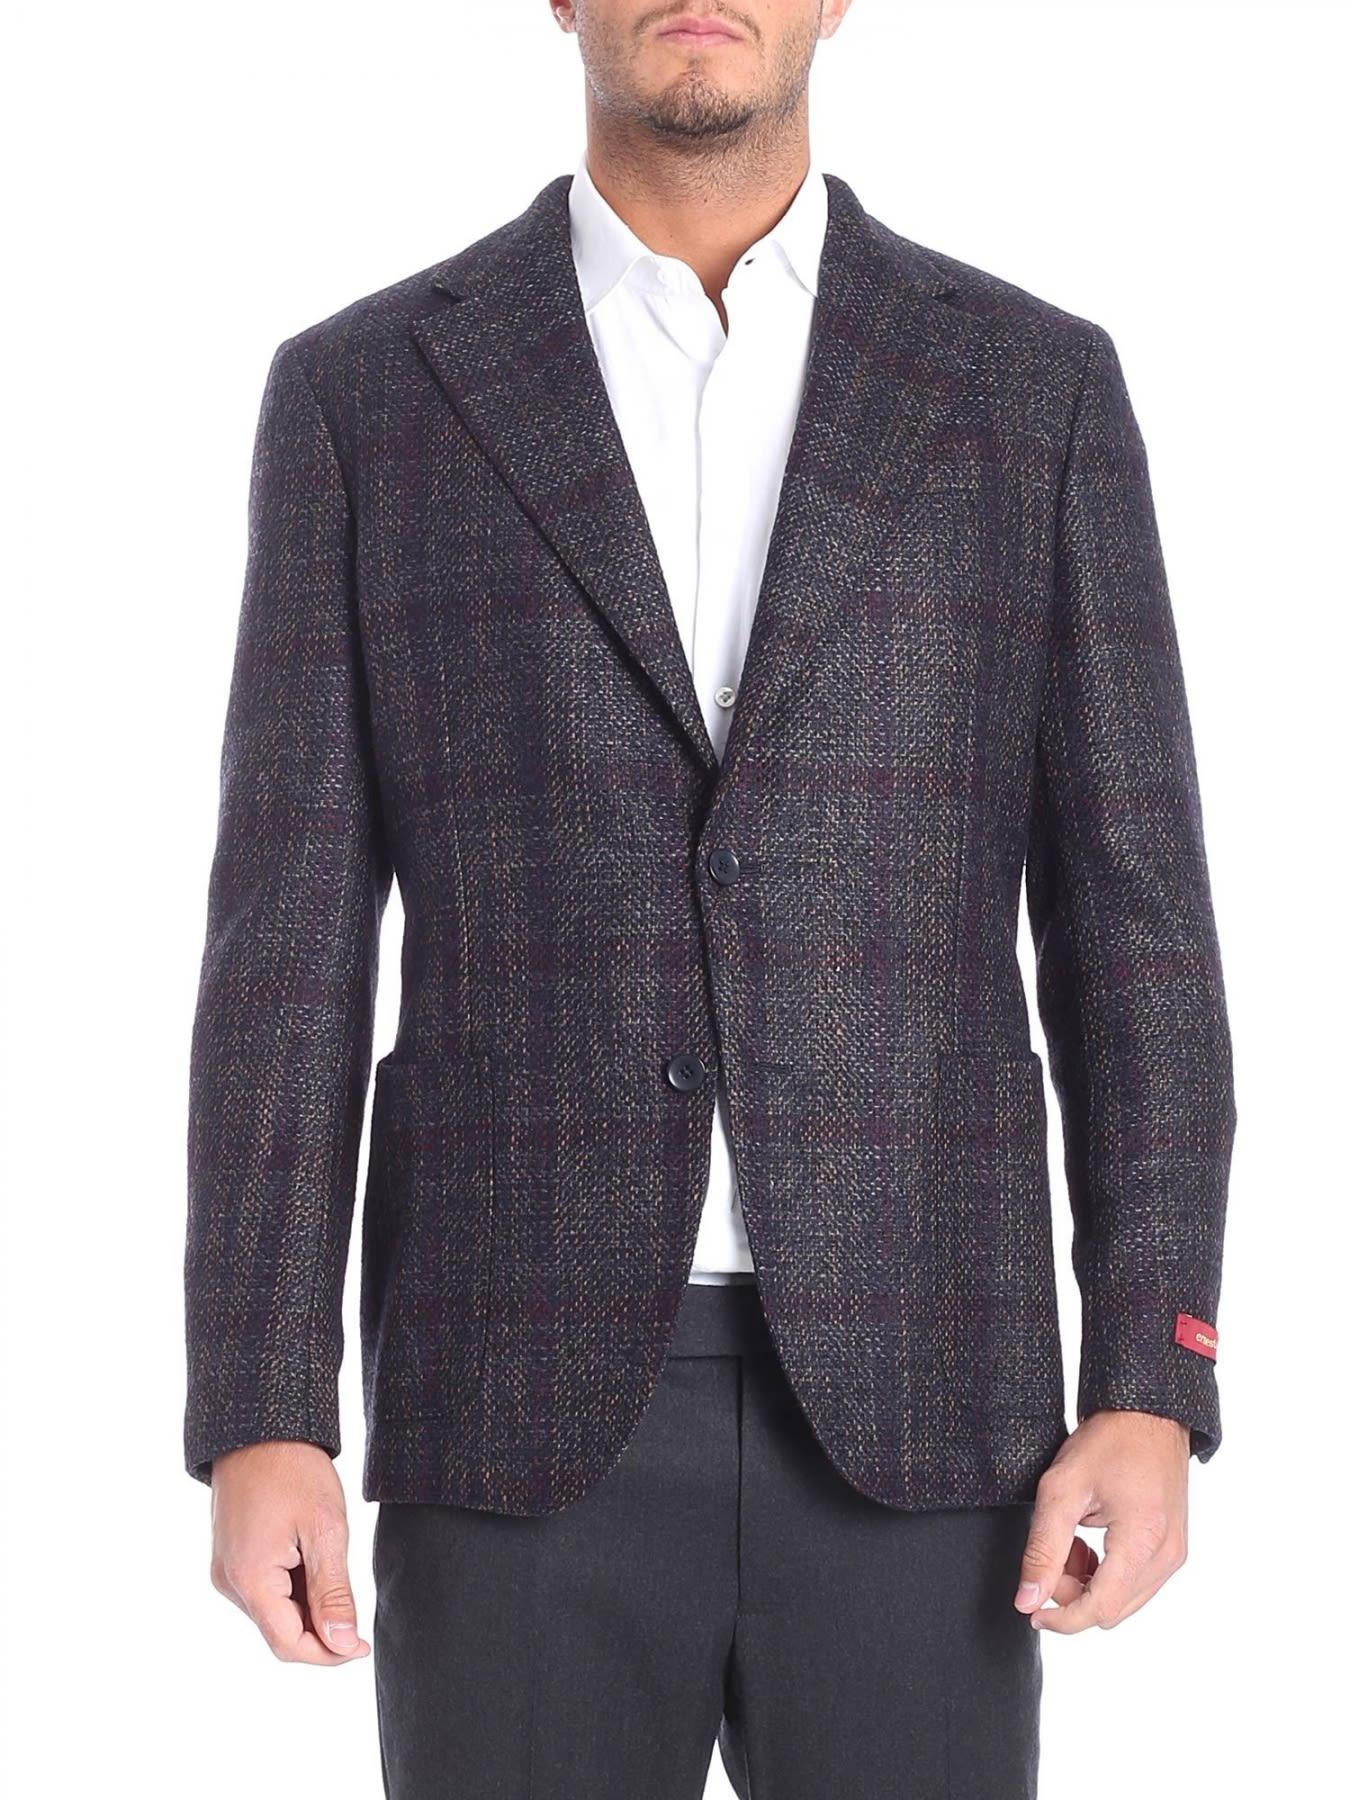 ERNESTO ESPOSITO Double-Breasted Woolen Cloth Jacket in Gray